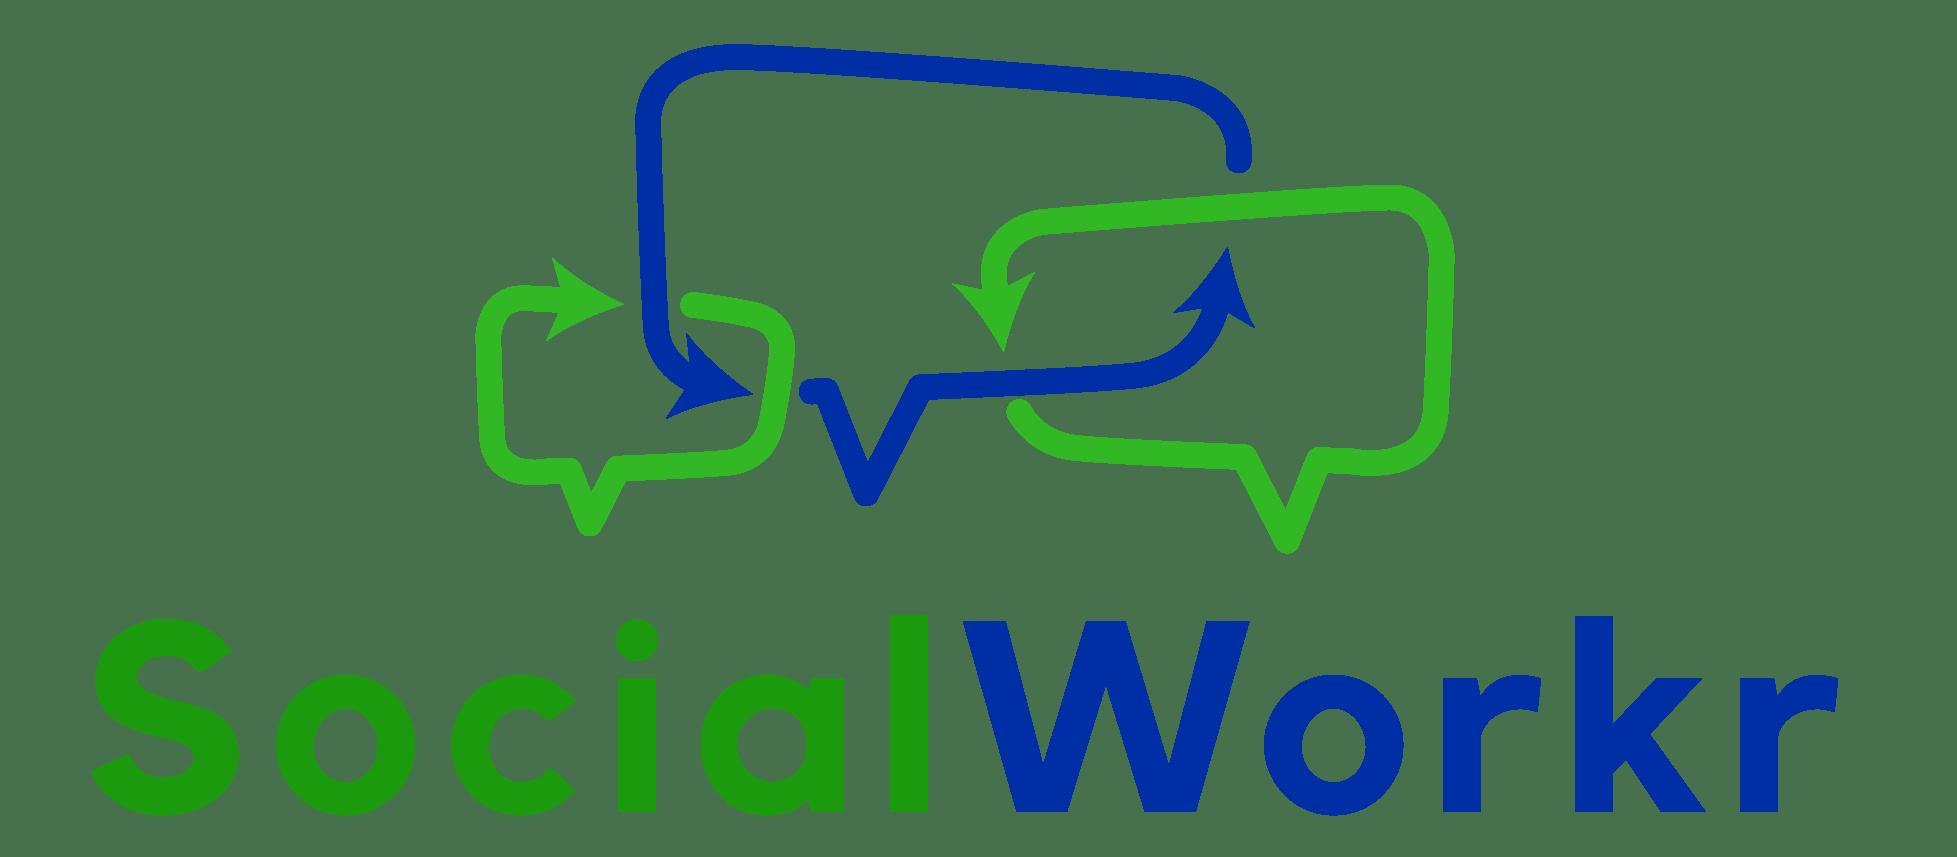 Create an account socialworkr. Friendship clipart social worker